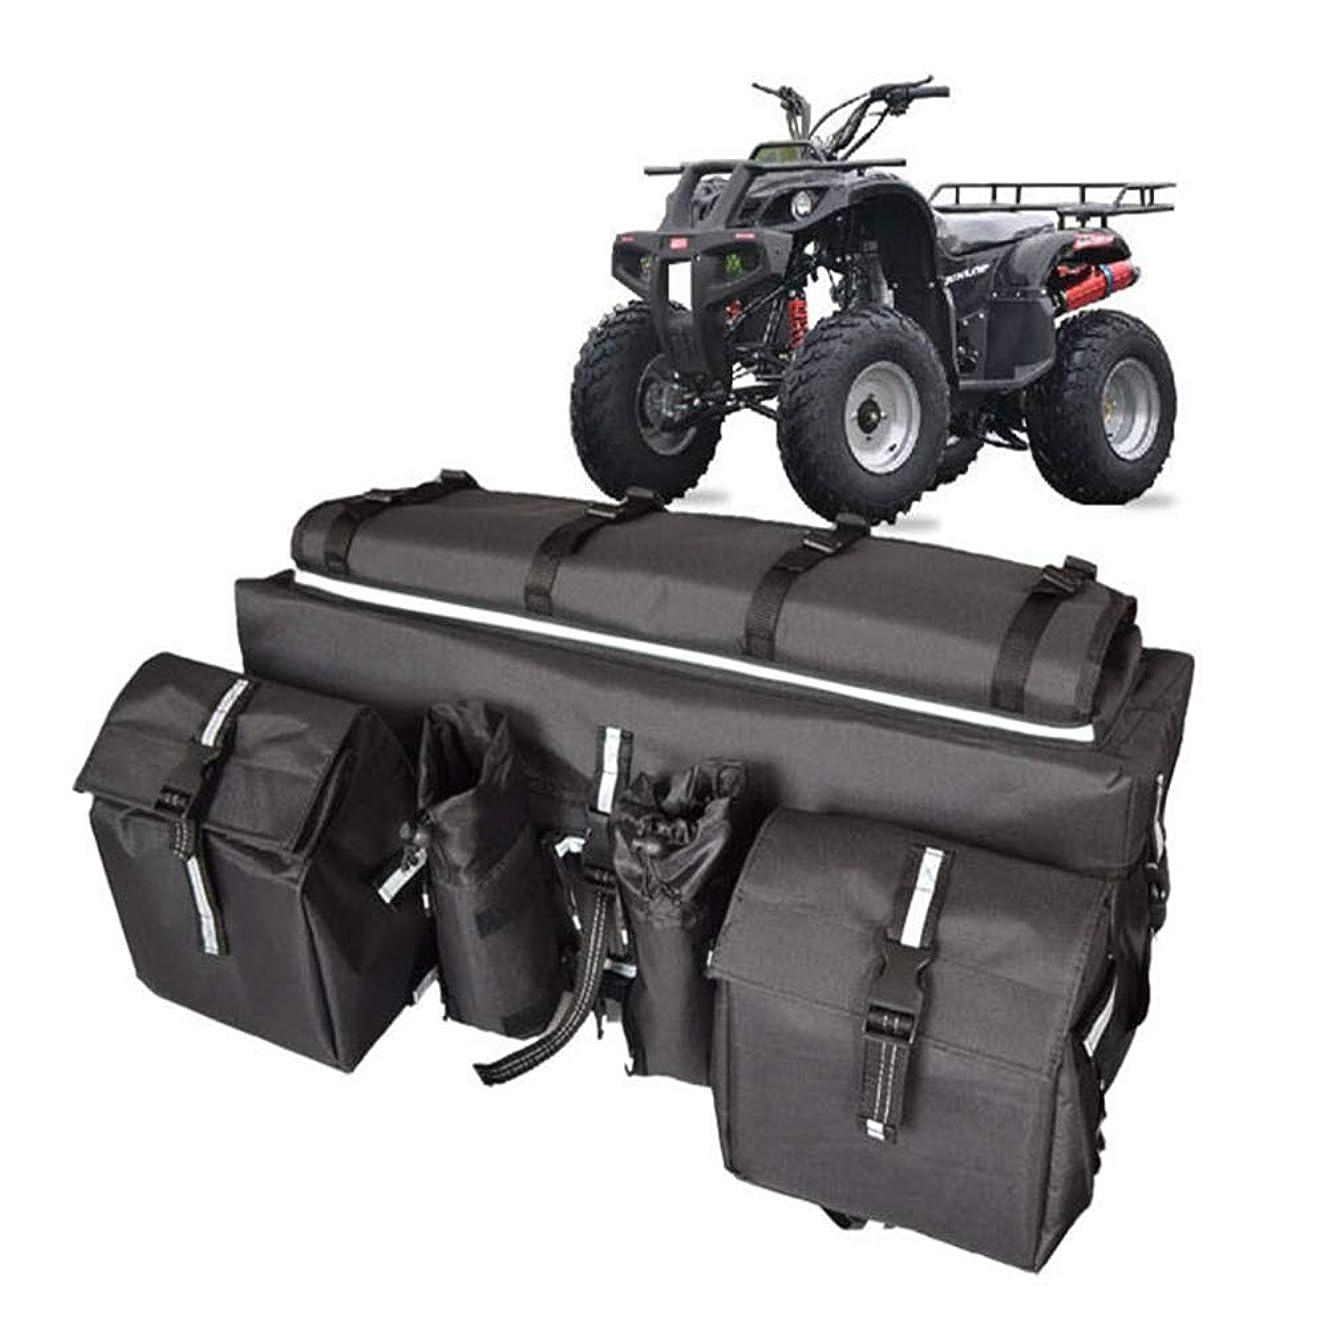 COCO Tec ATV Cargo Bag,Rear Rack Storage Gear Bag with Topside Bungee Tie-Down Storage Padded-Bottom,Waterproof,Heavy Duty